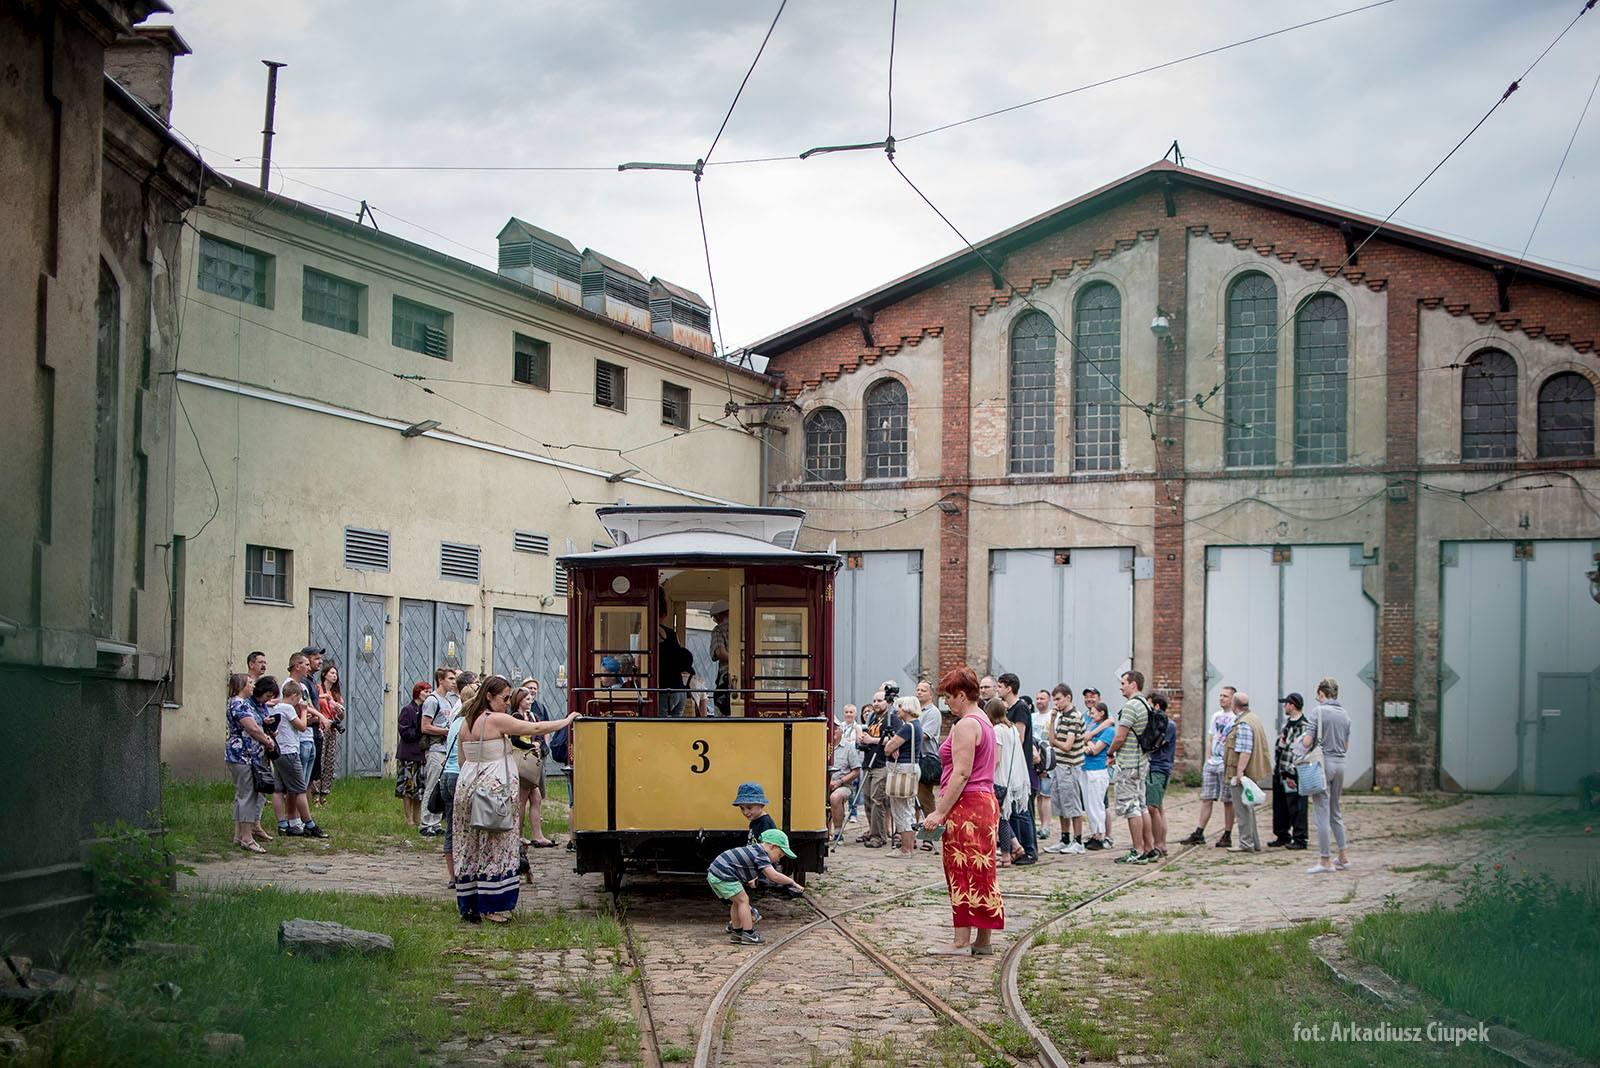 Fot. Arkadiusz Ciupek